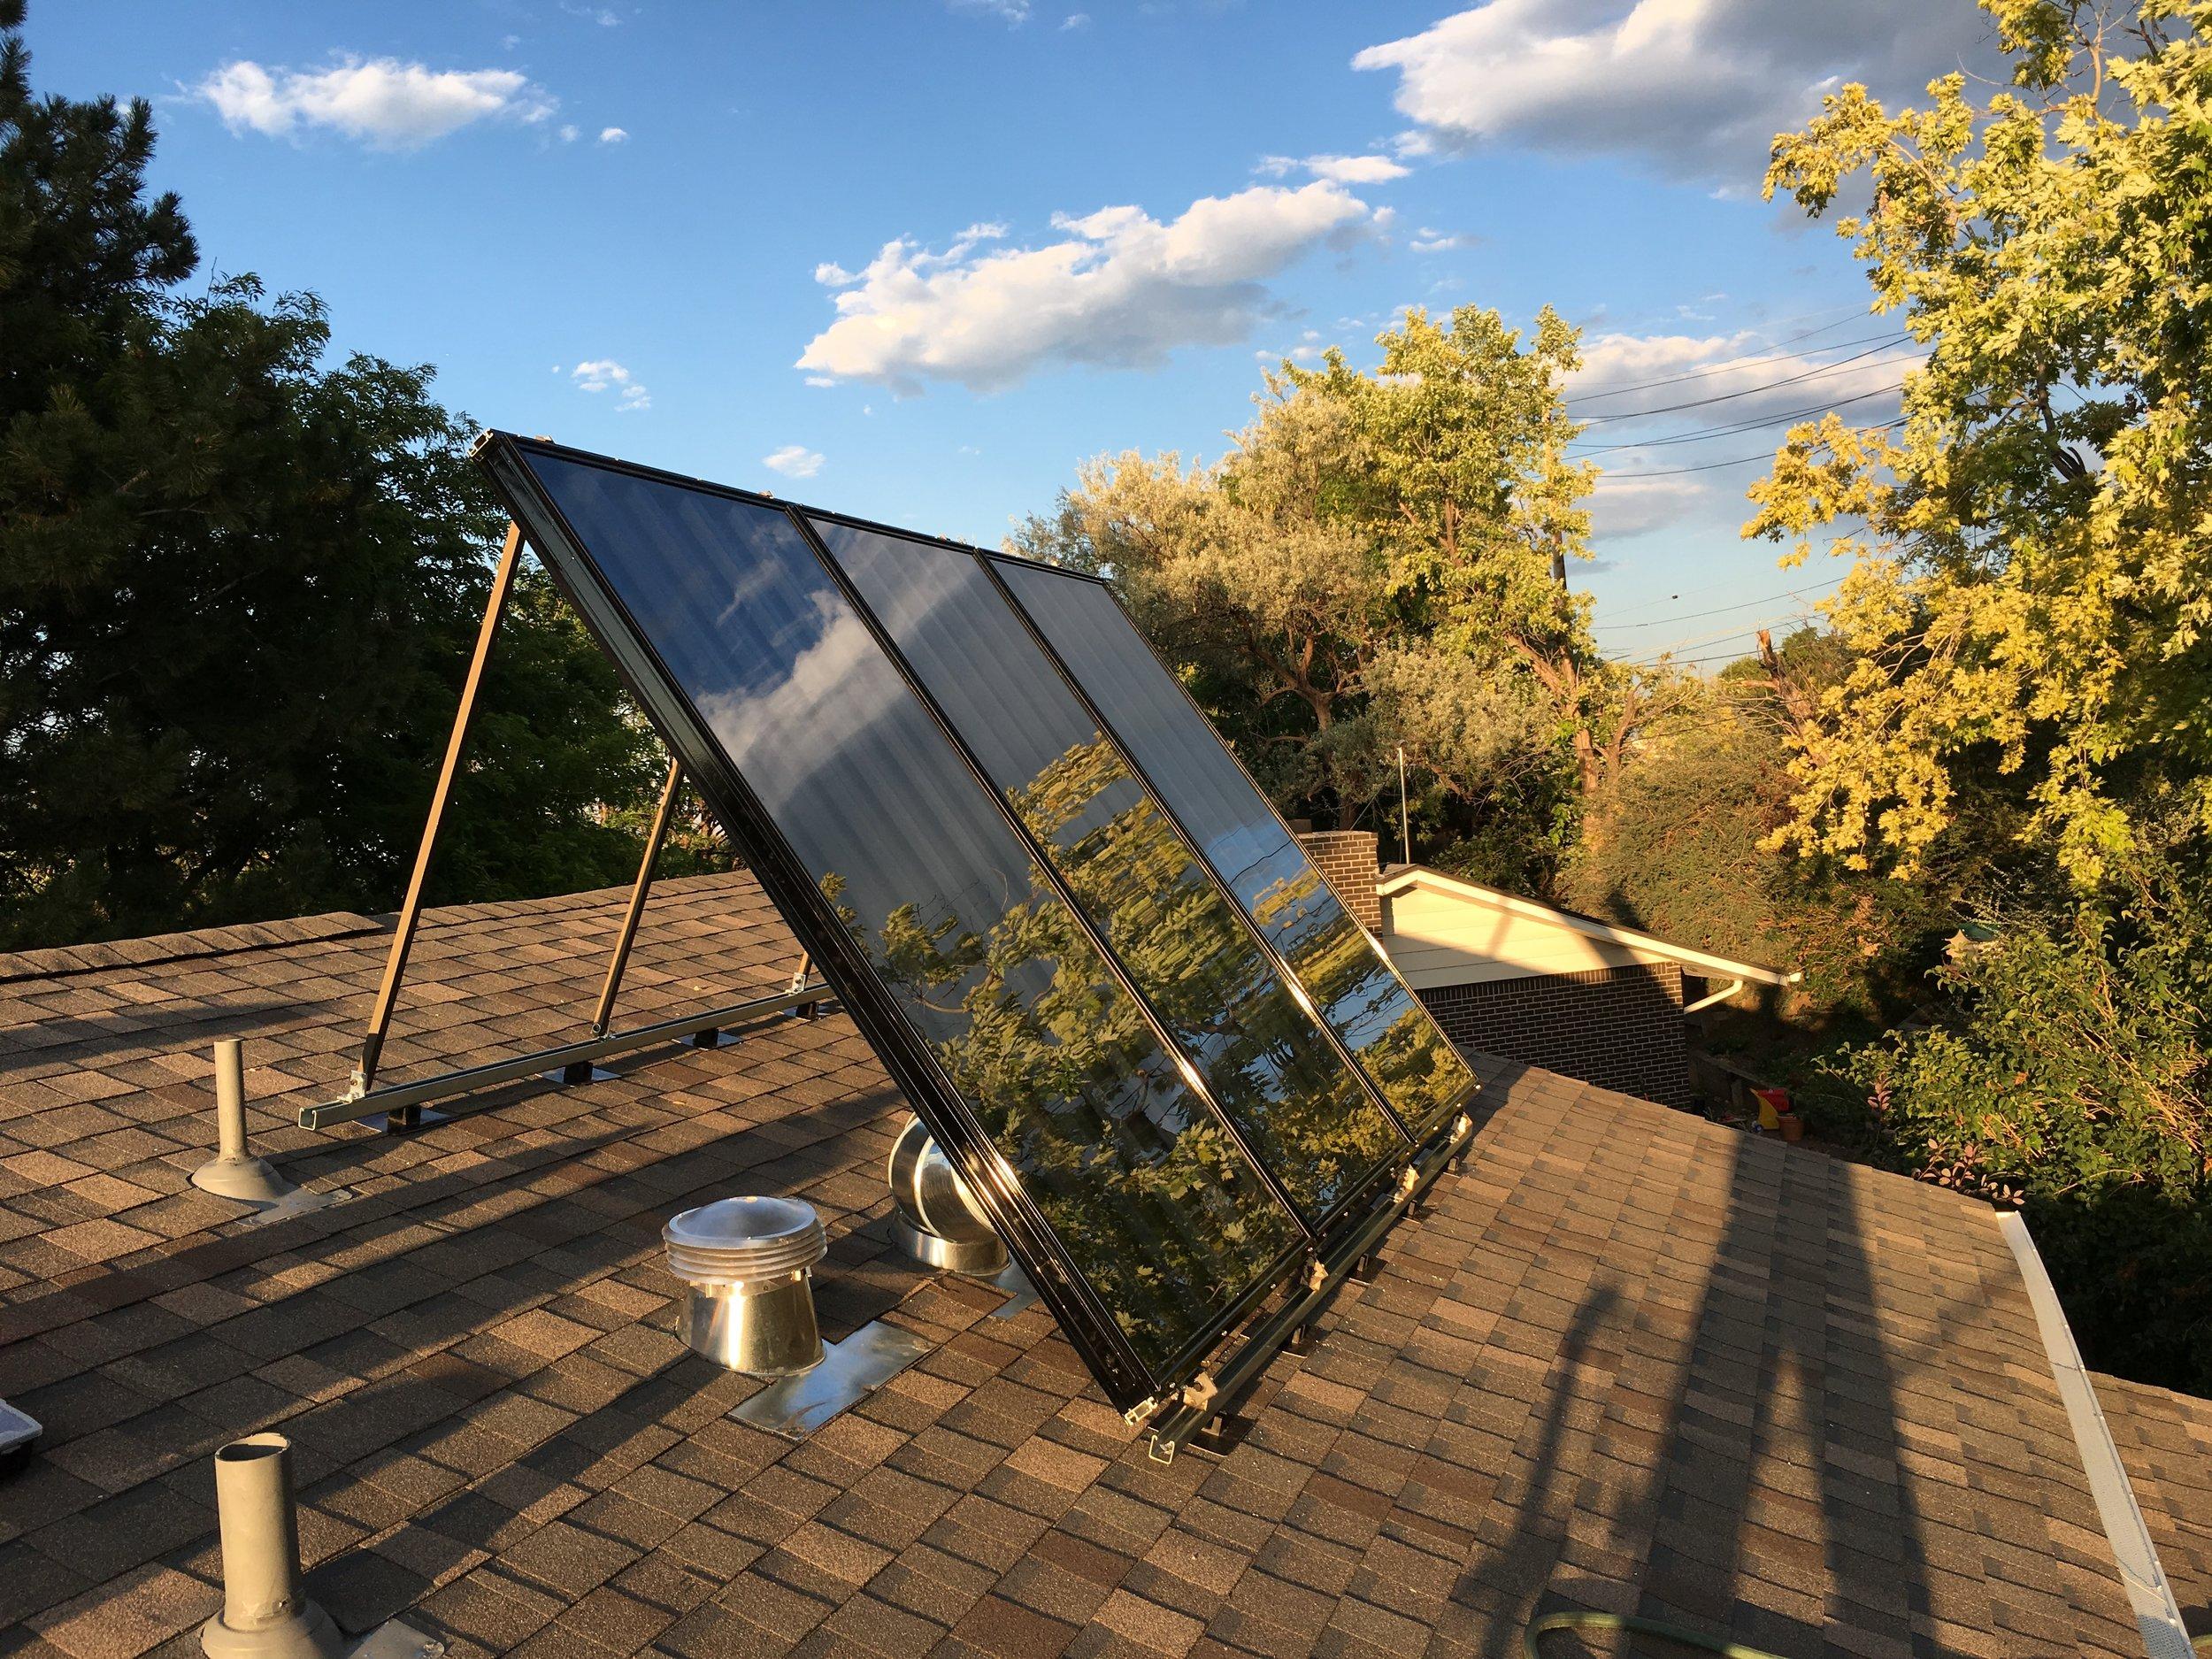 New Solar Air Panel